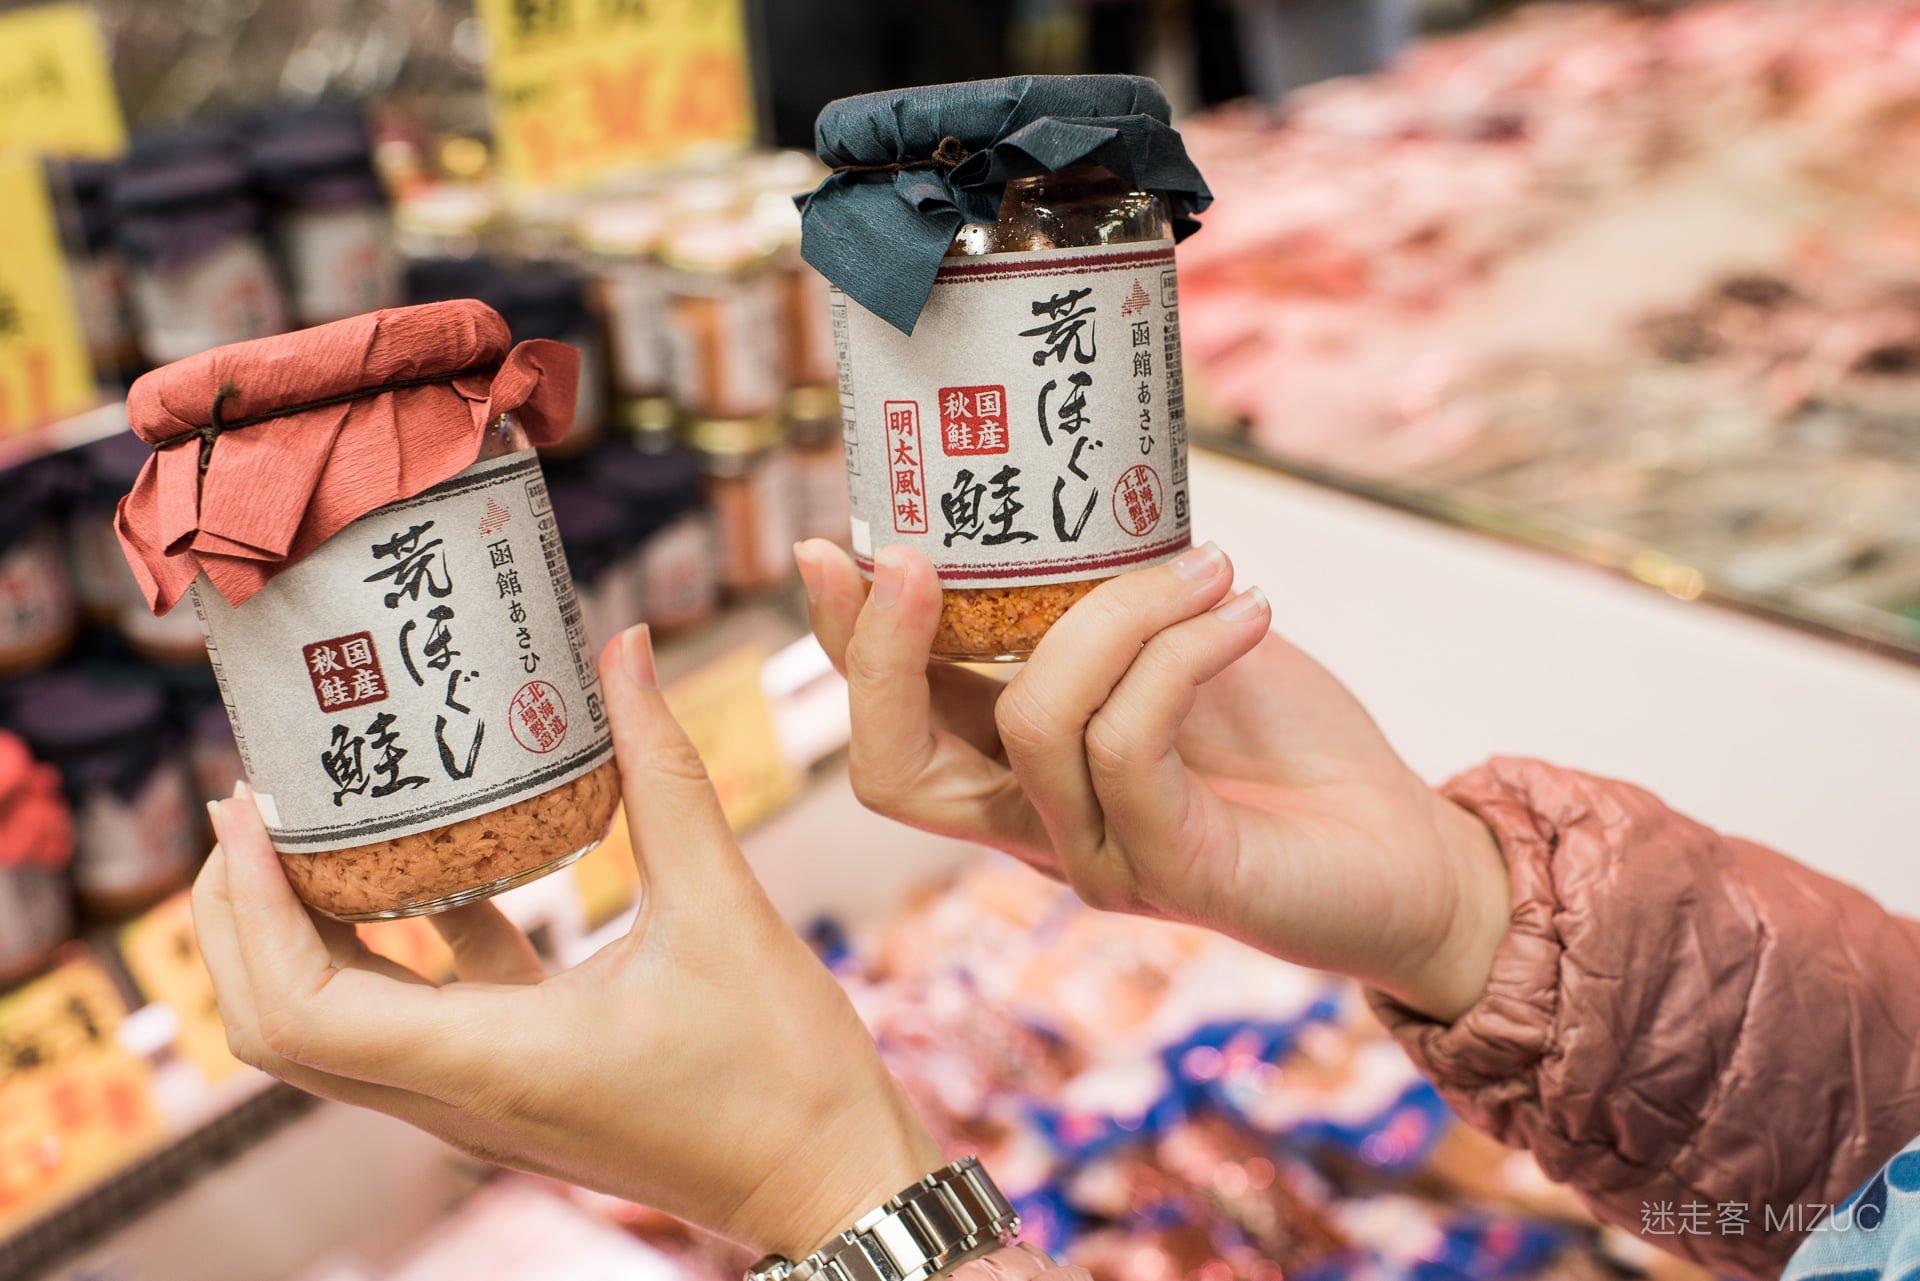 201711 Ibaraki Tochigi Gunma Japan Travel By RentalCar 5 日本自駕旅遊/北關東三縣「茨城、櫪木、群馬」秋天美食、溫泉與瀑布秘境百景(精選照片分享)